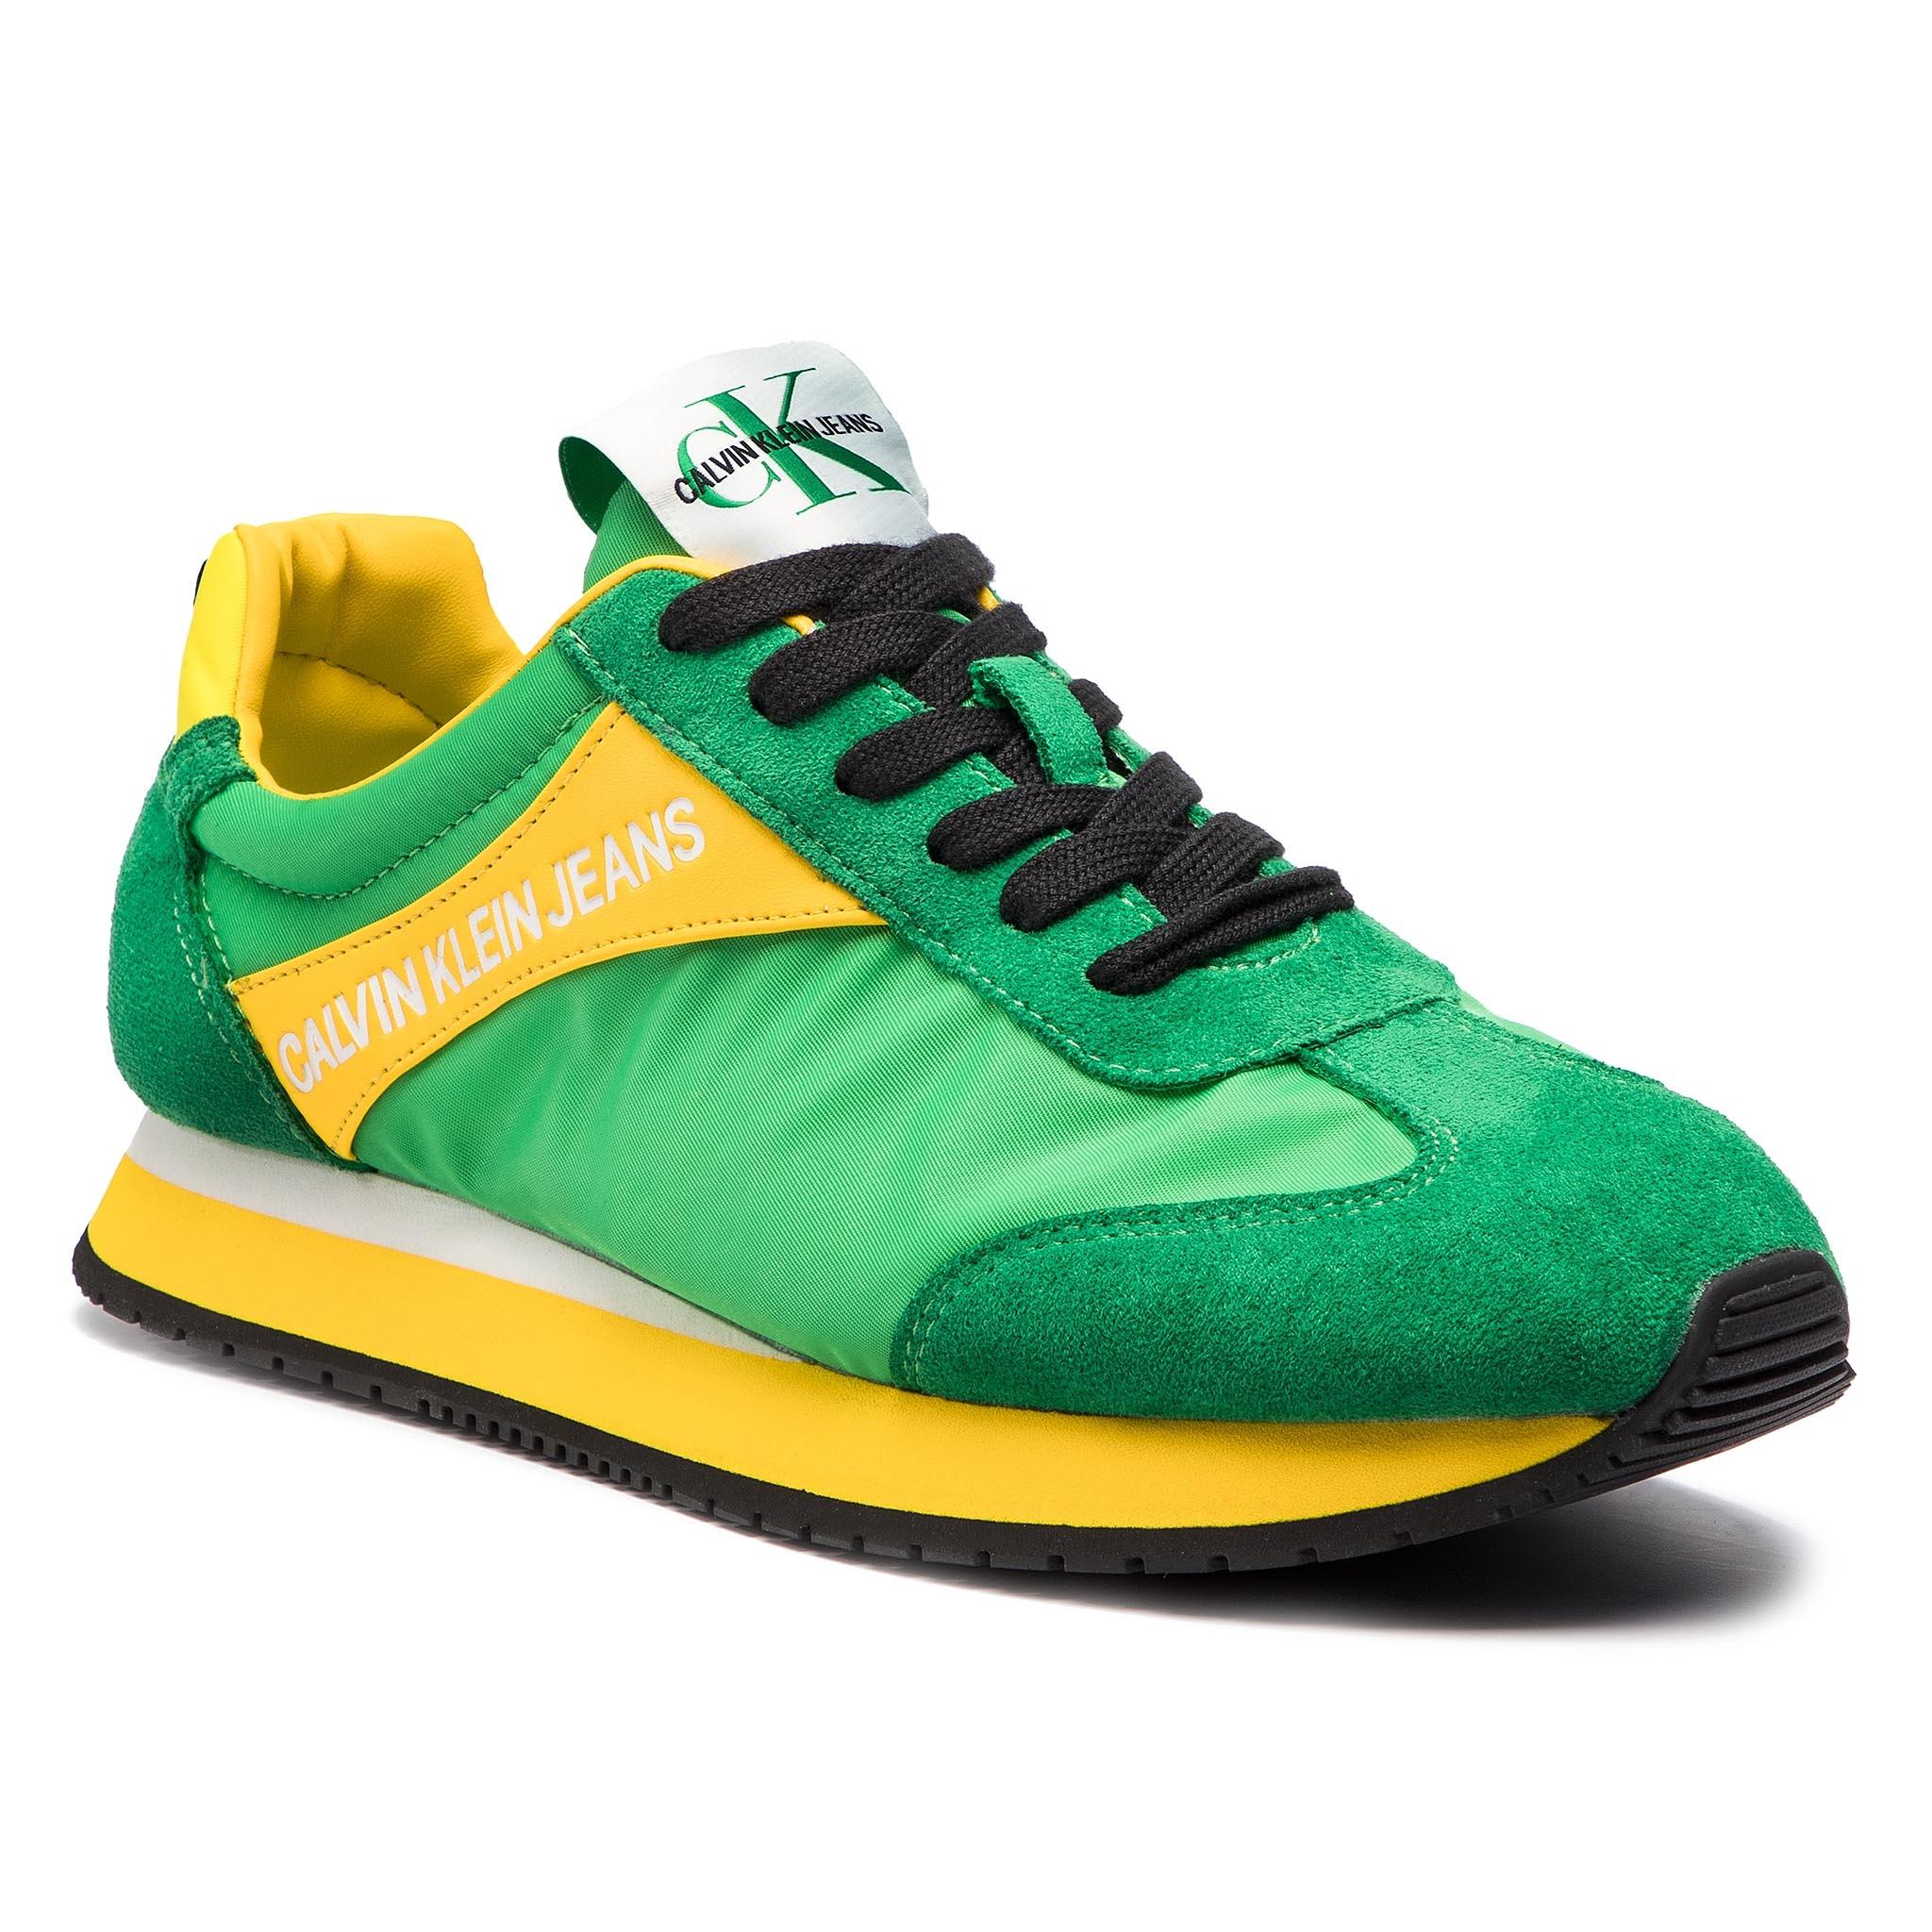 Image of Sneakers CALVIN KLEIN JEANS - Jerrold S0615 Multi Green